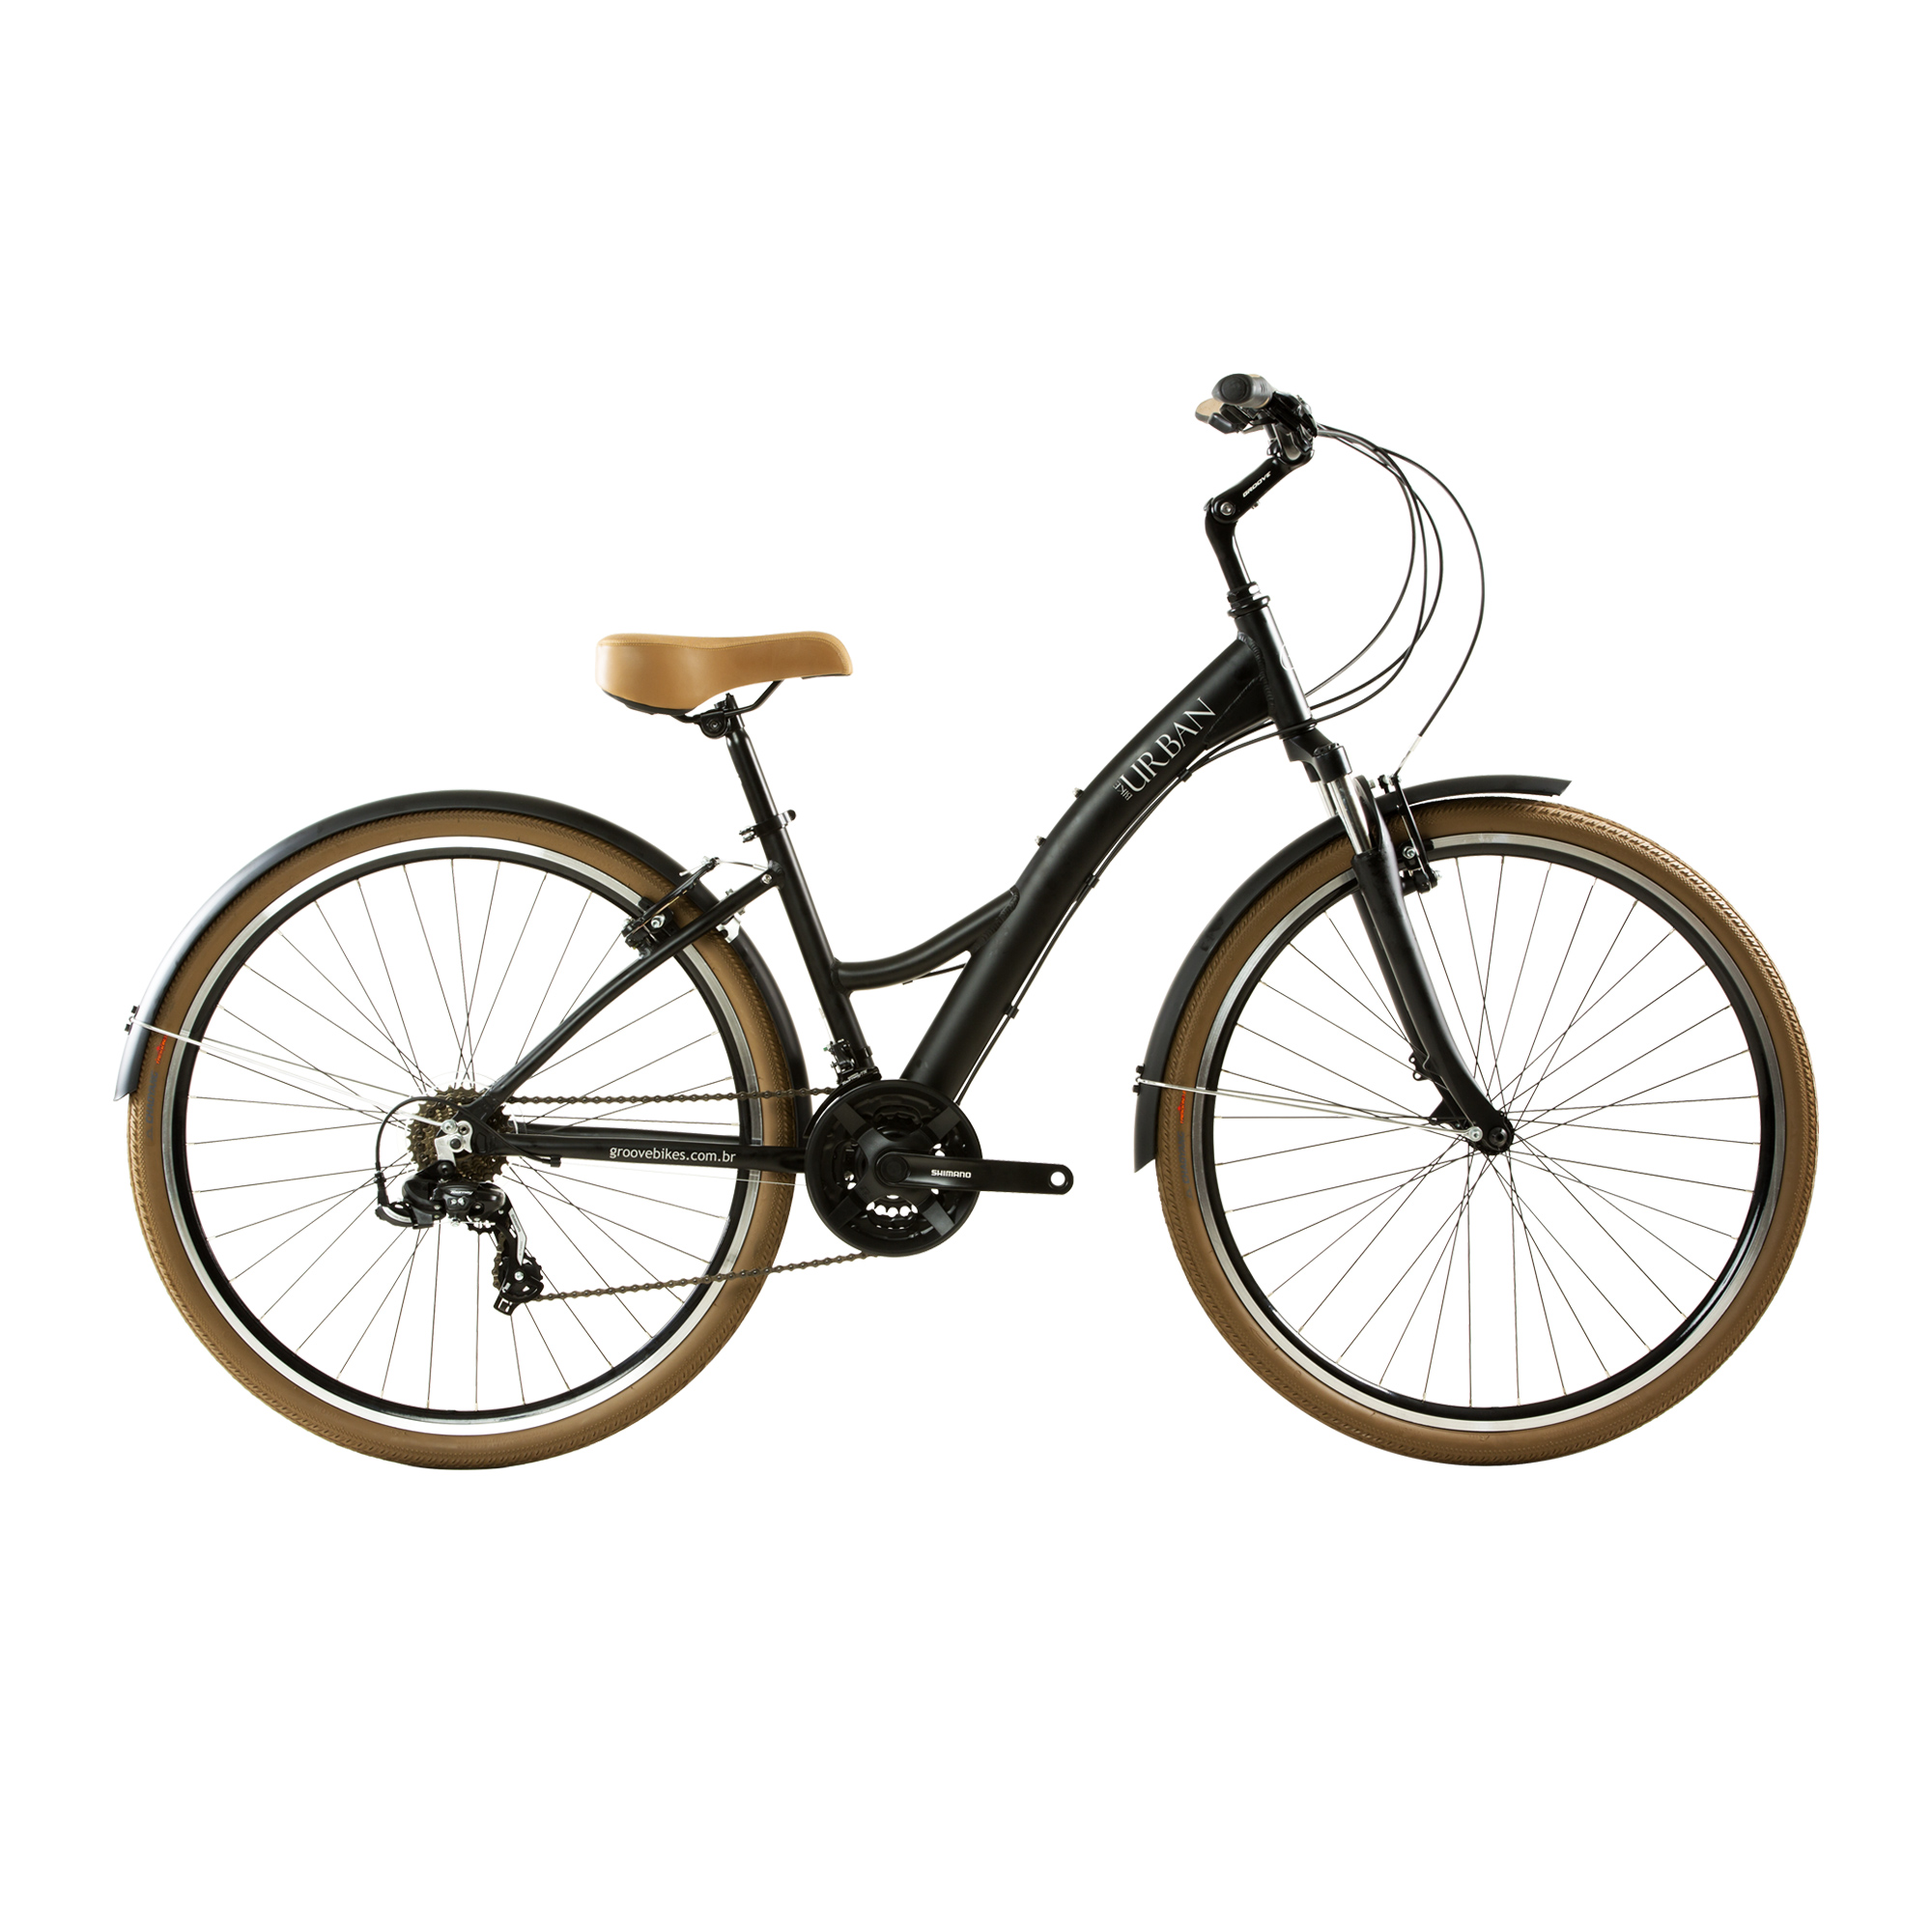 Bicicleta-urbana-Groove-Urban-VB-01-